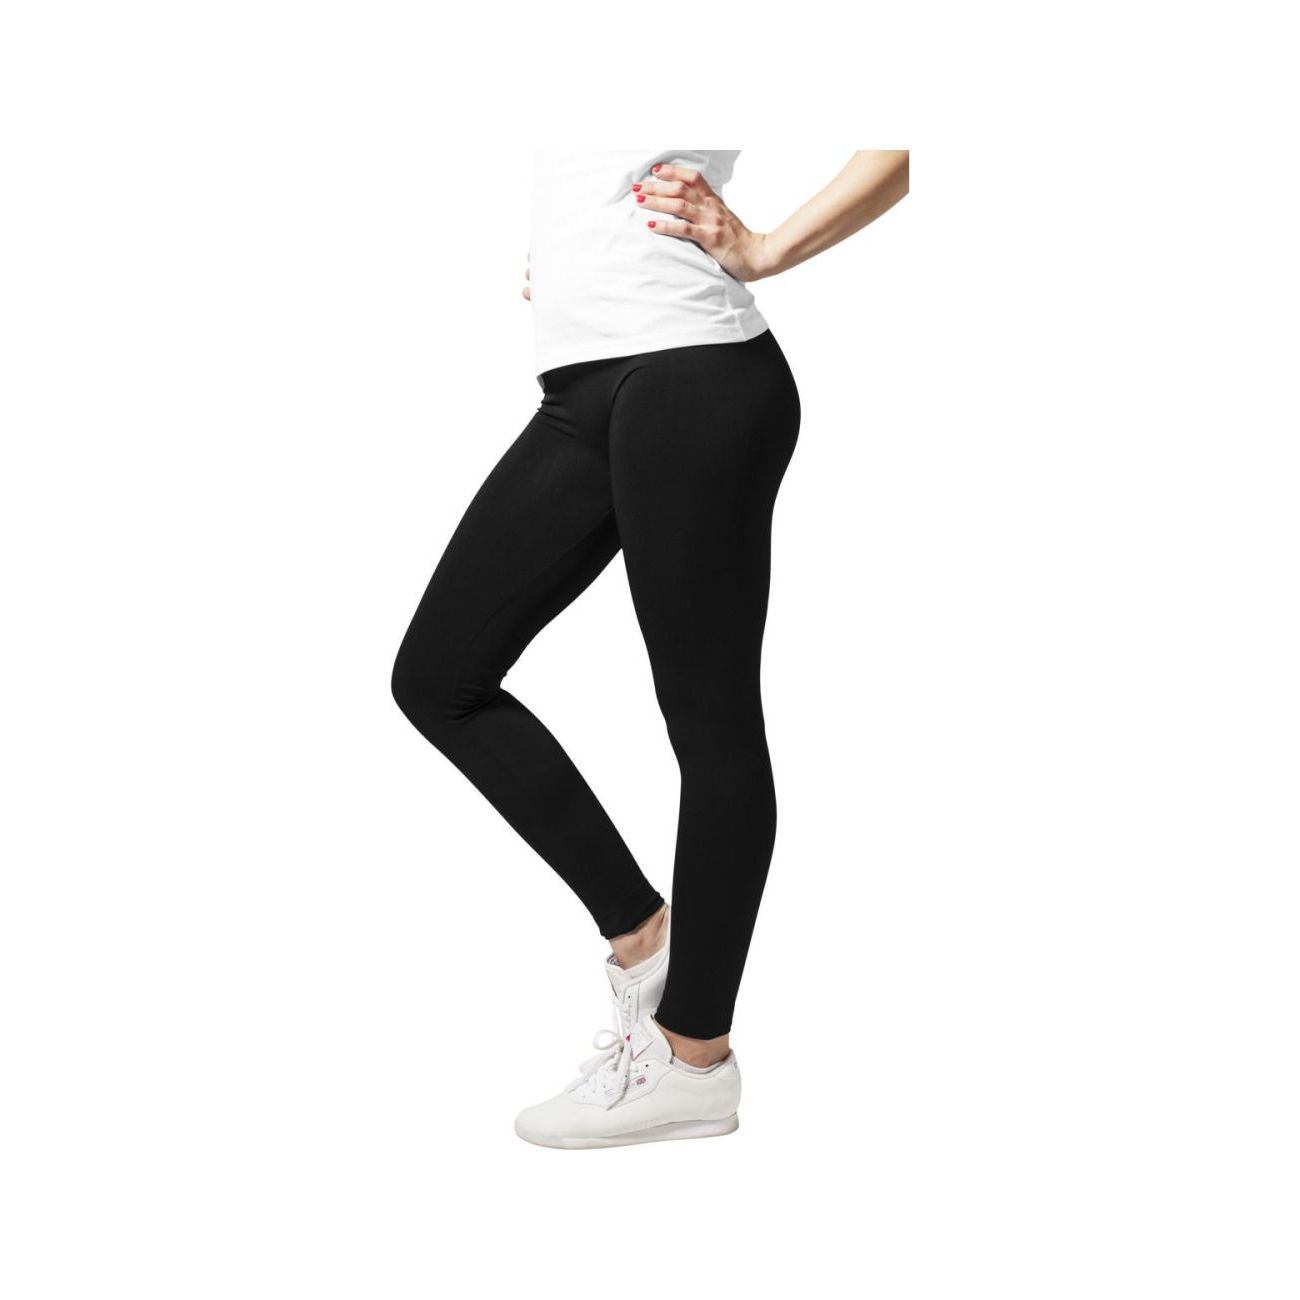 Mode- Lifestyle femme URBAN CLASSICS Legging Urban Classics Femme Noir Polyamide